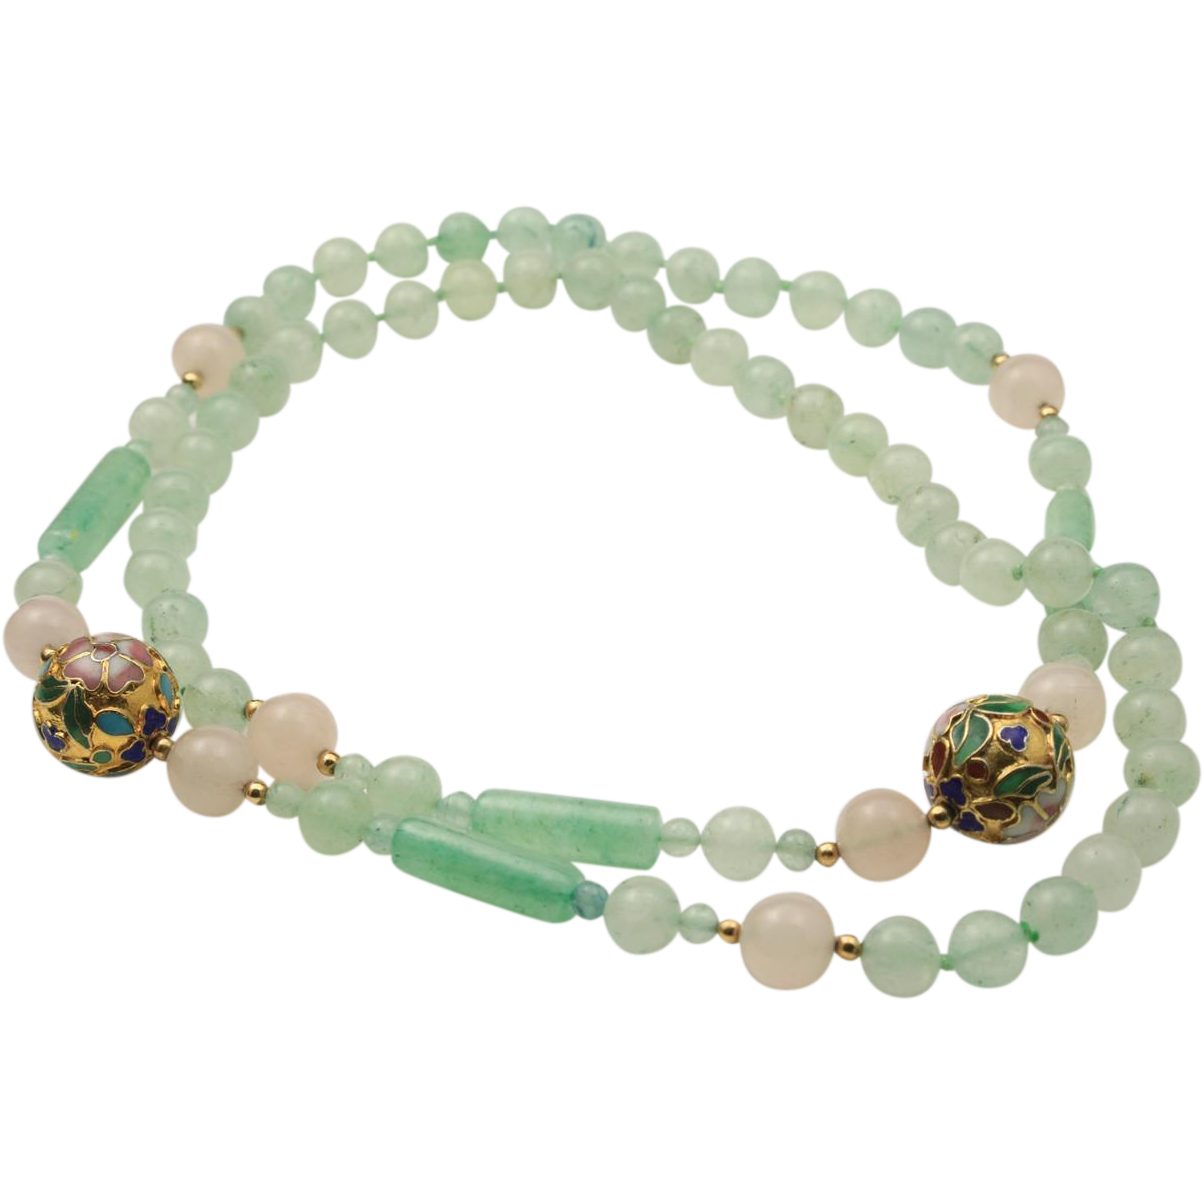 Vintage Rose Quartz & Green Aventurine Bead Necklace with Gold Cloisonne Balls